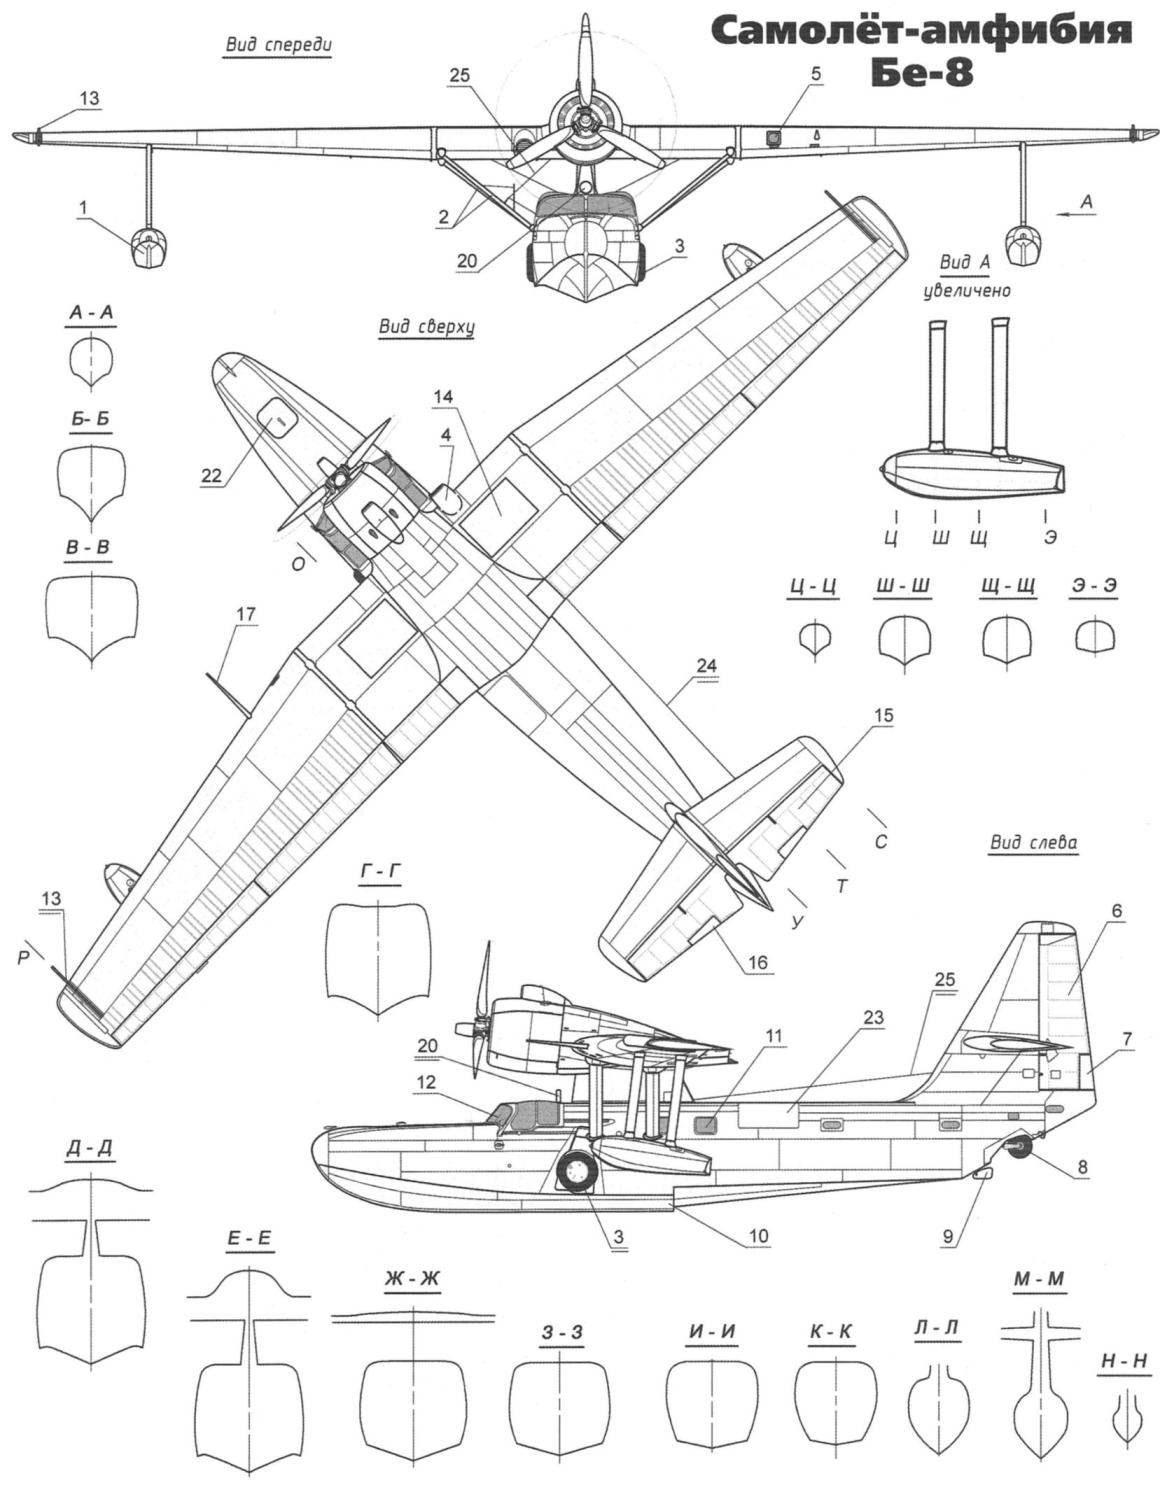 Самолёт-амфибия Бе-8